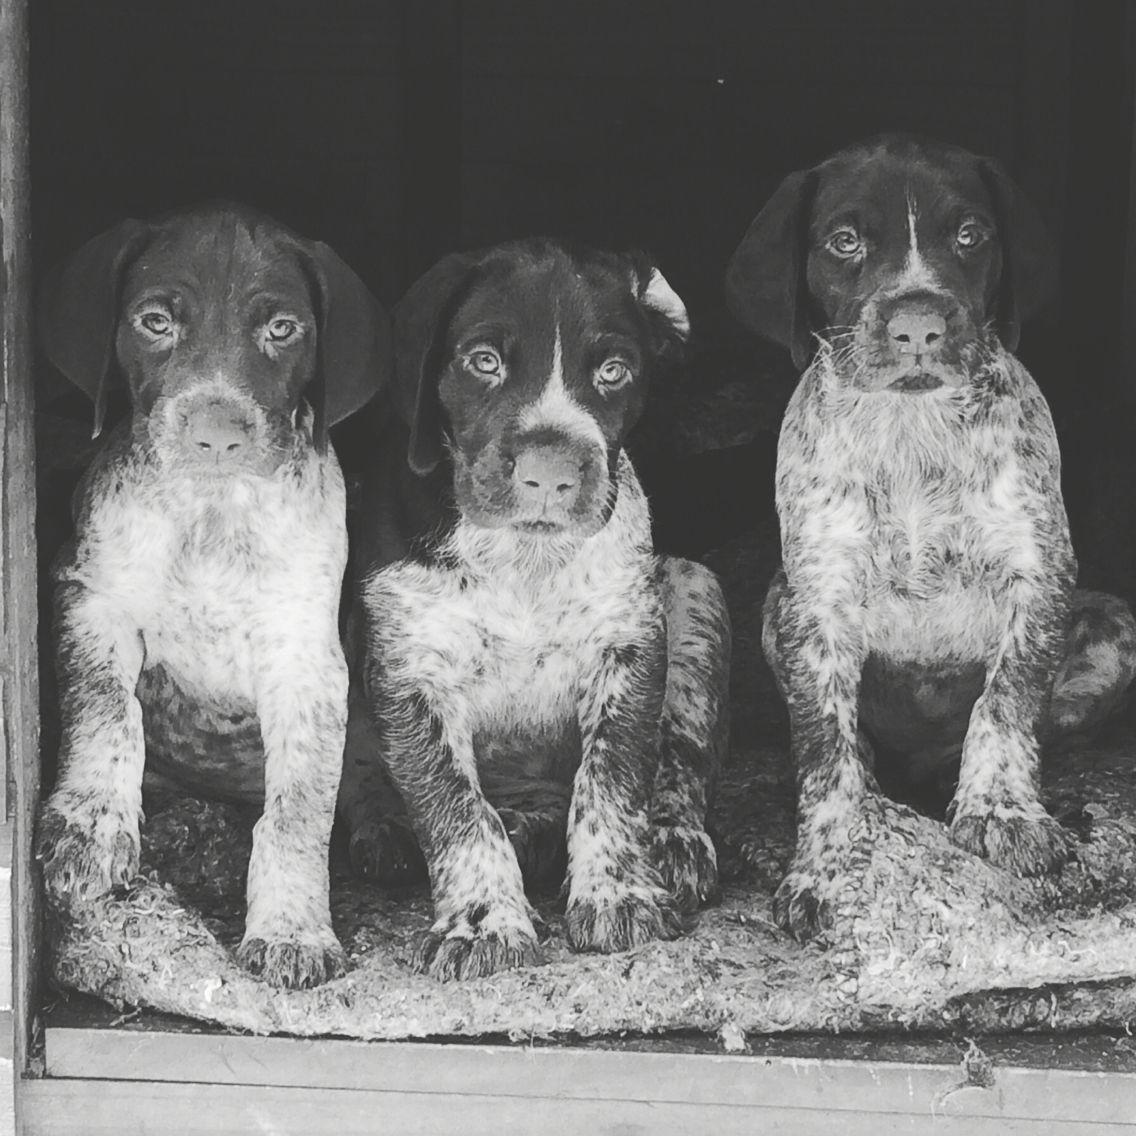 German Shorthaired Pointer Puppies 6 weeks